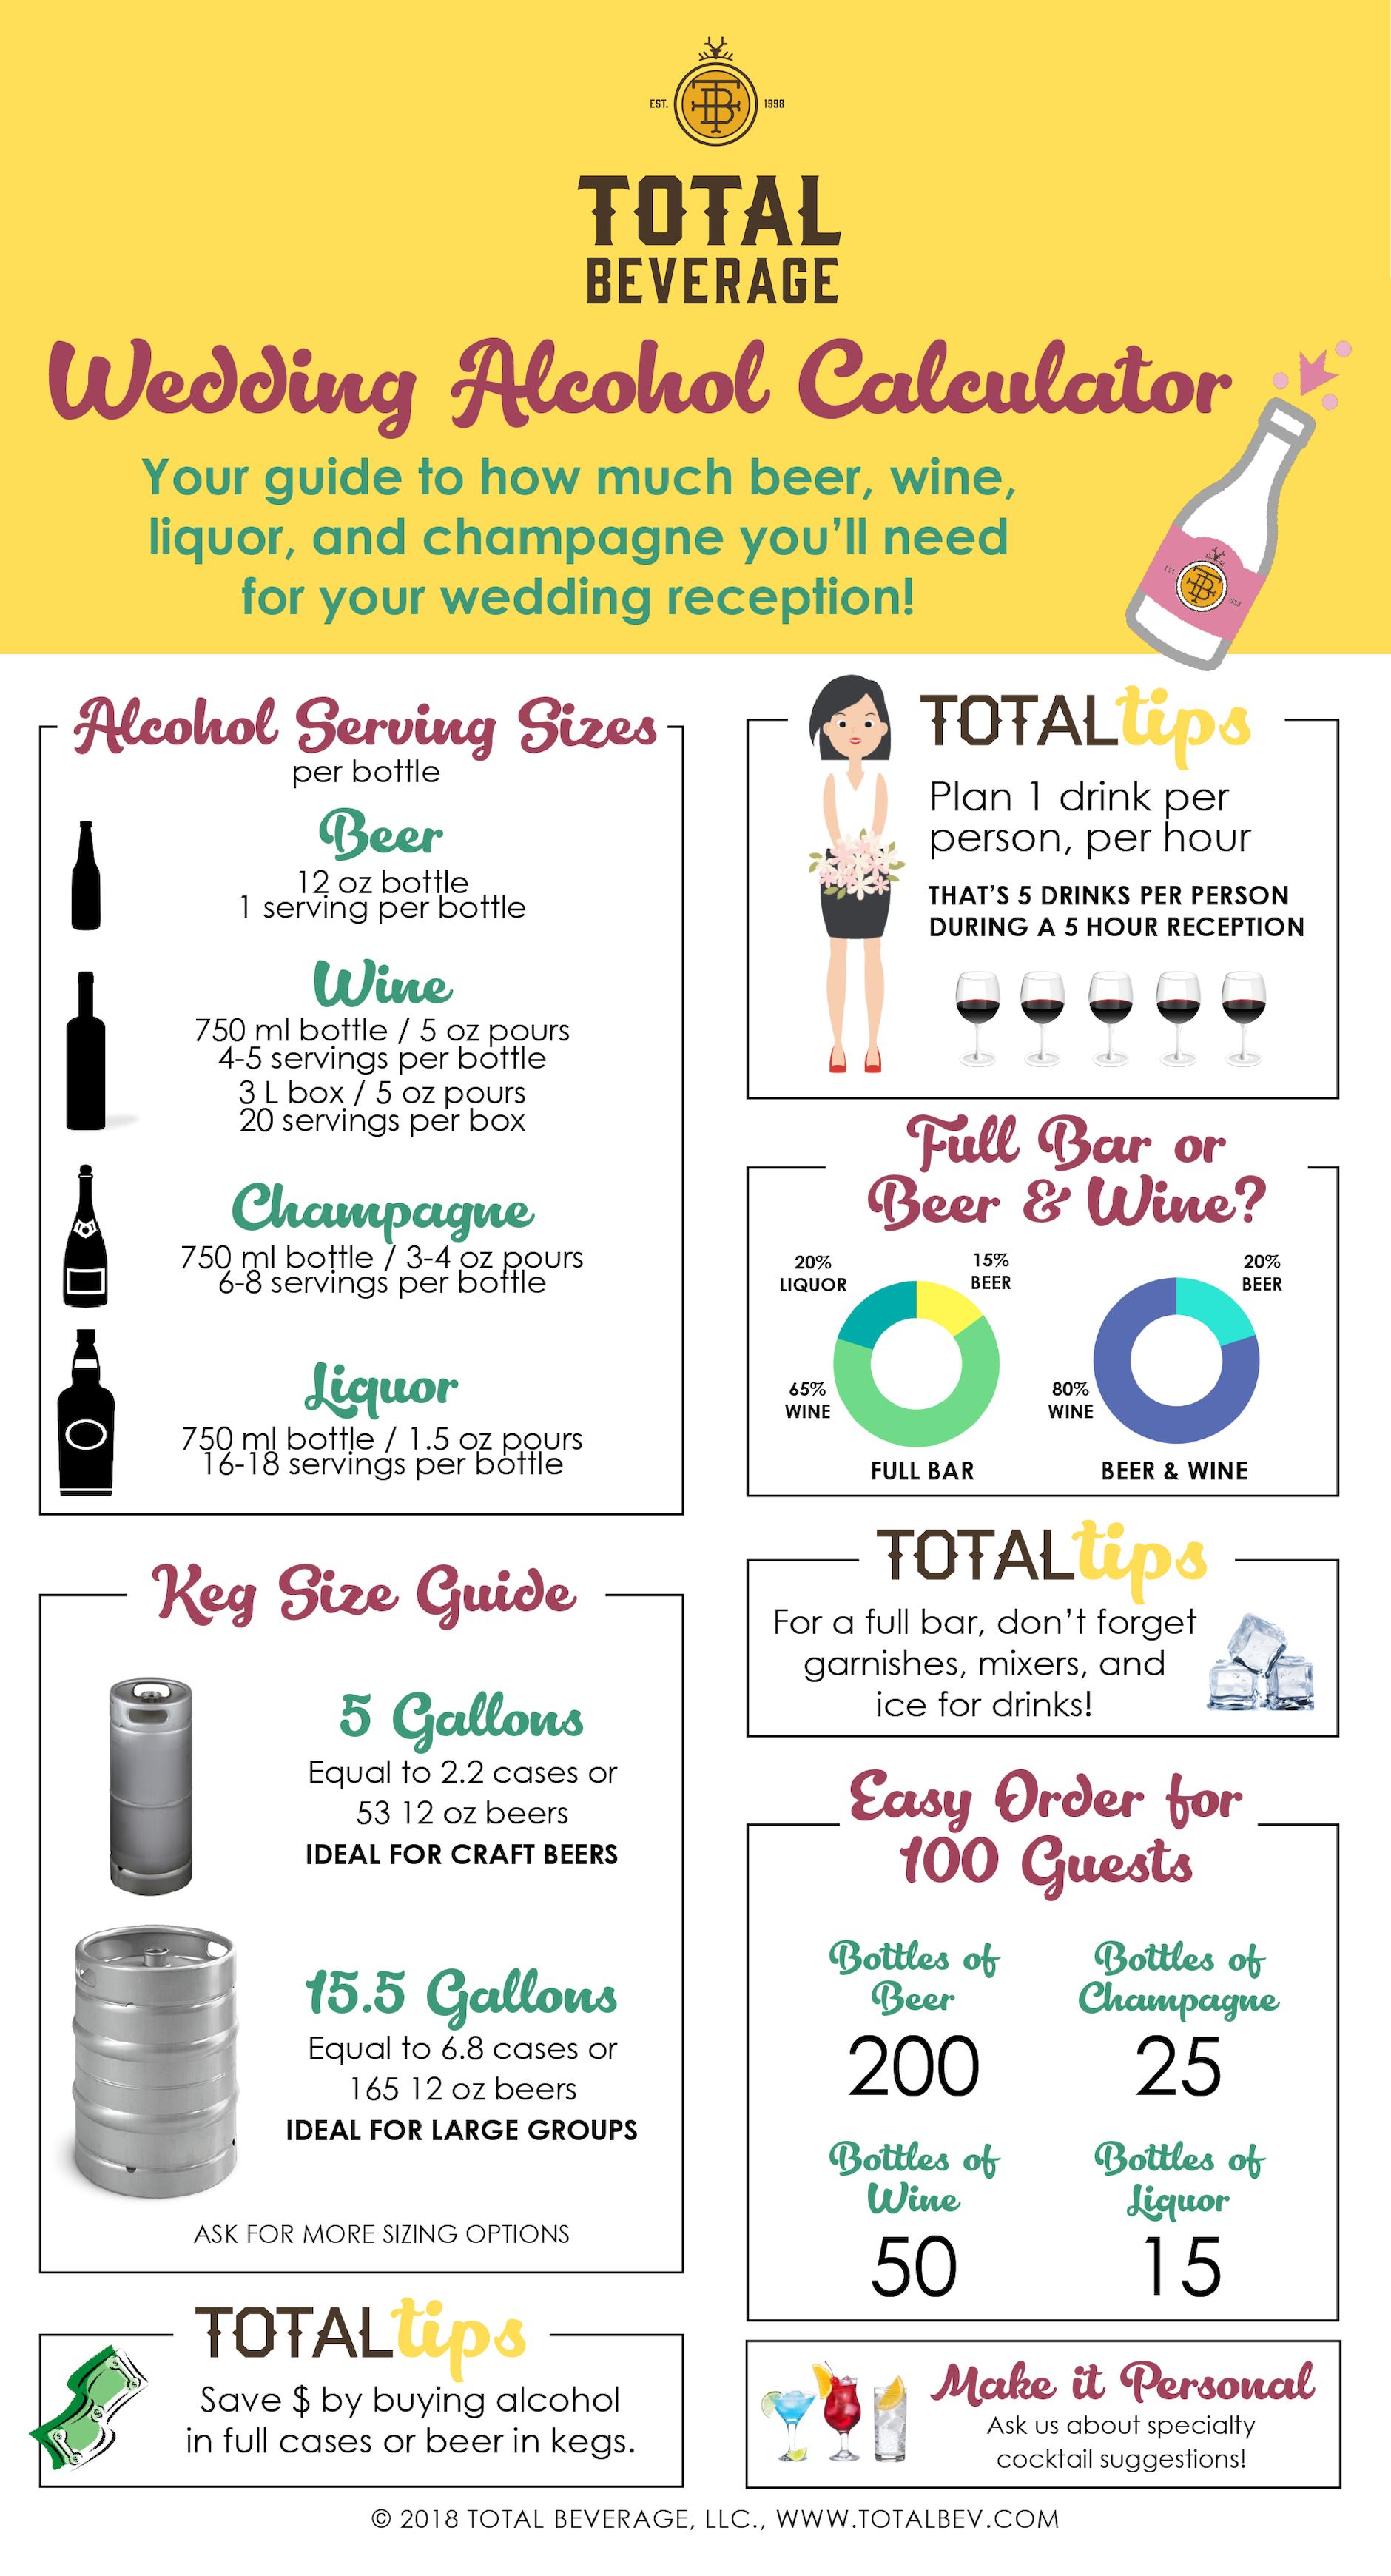 Total Beverage Wedding Alcohol Calculator Alcohol Calculator Wedding Alcohol Calculator Beer Wedding